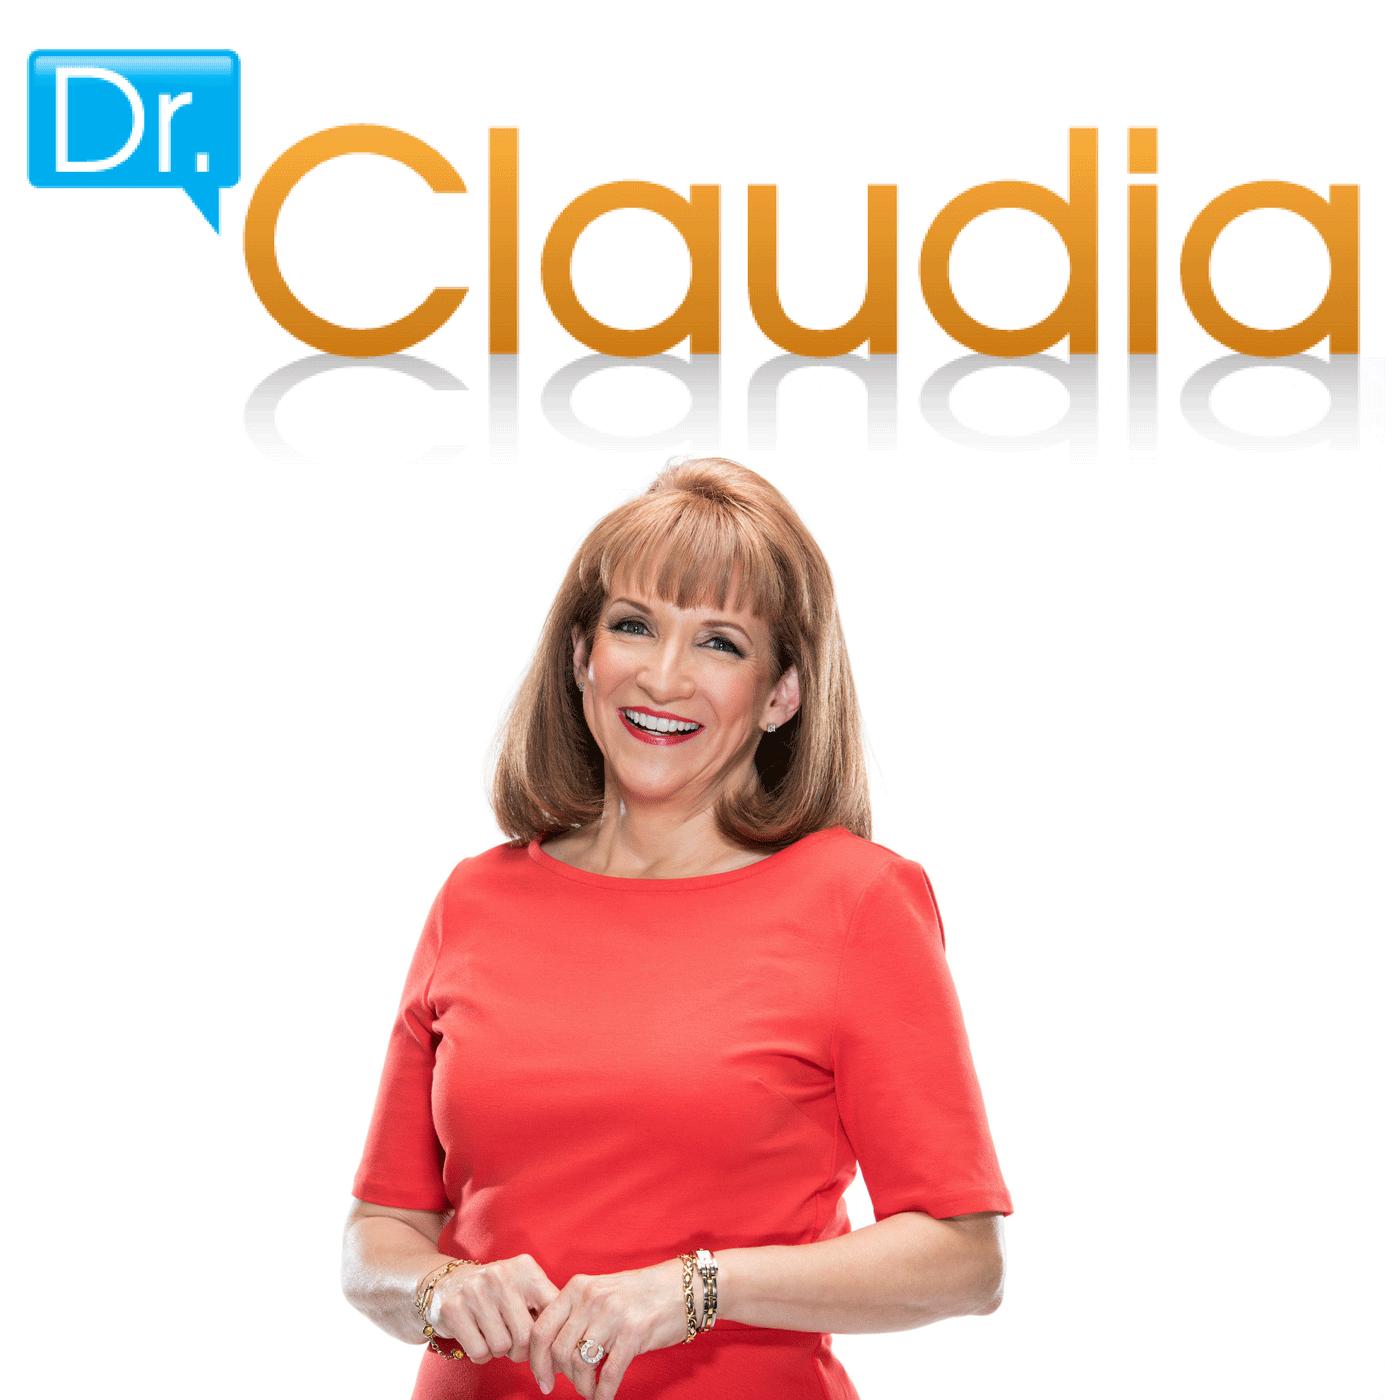 The Dr. Claudia Show show art